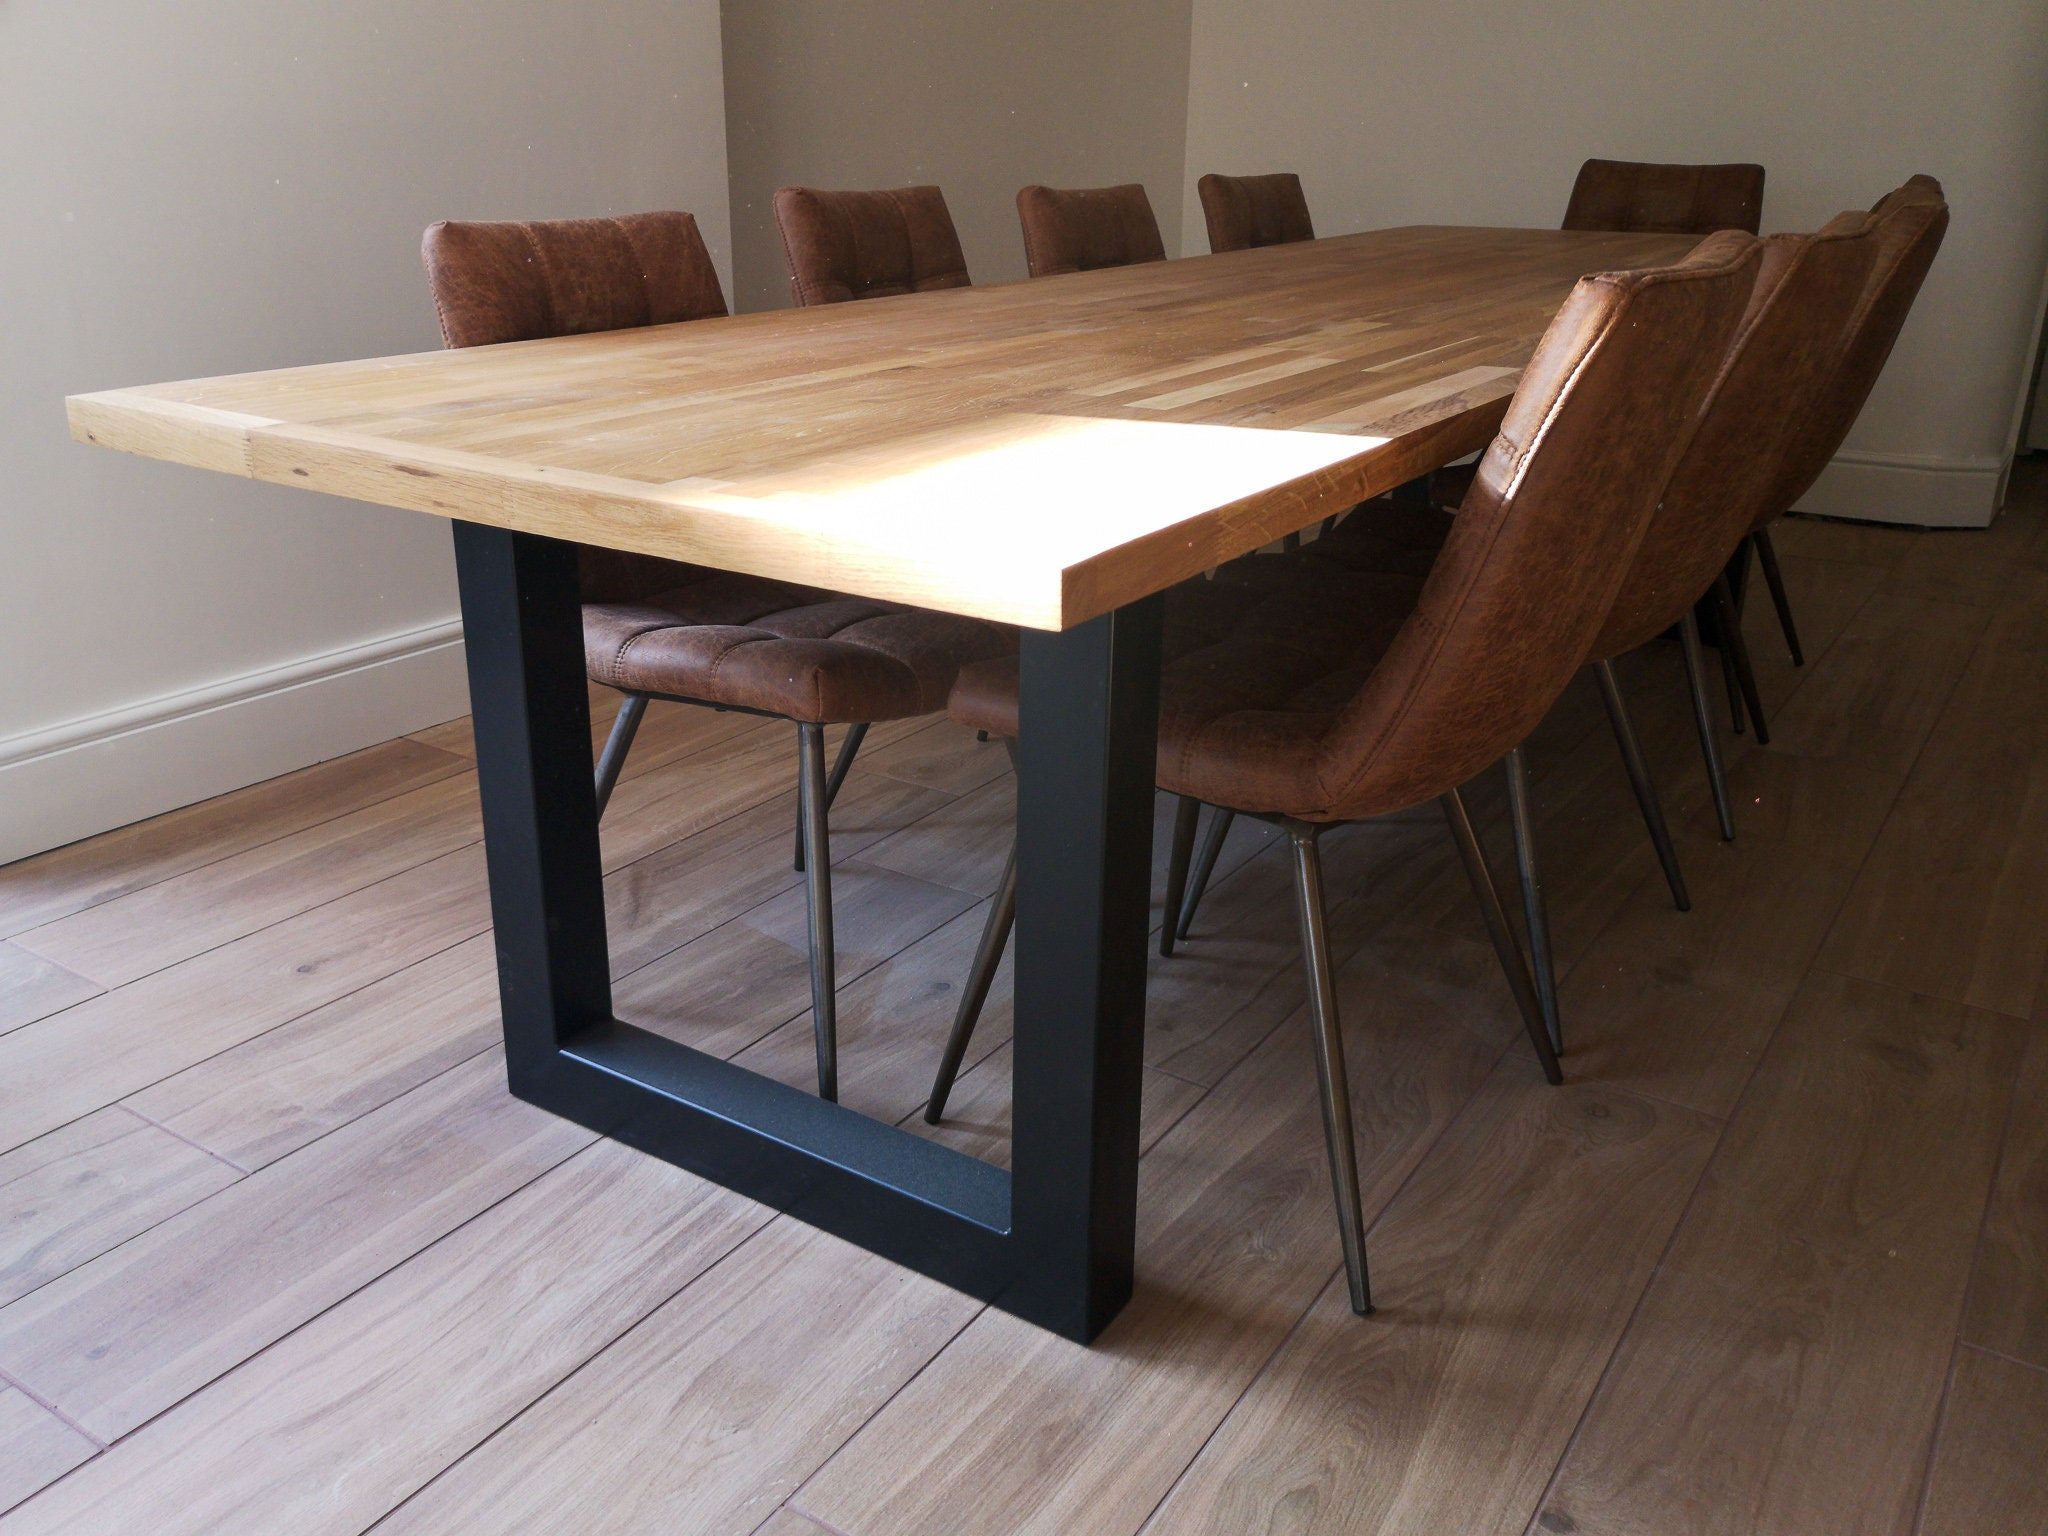 Metal Dining Table Legs Industrial, Dining Room Table Legs